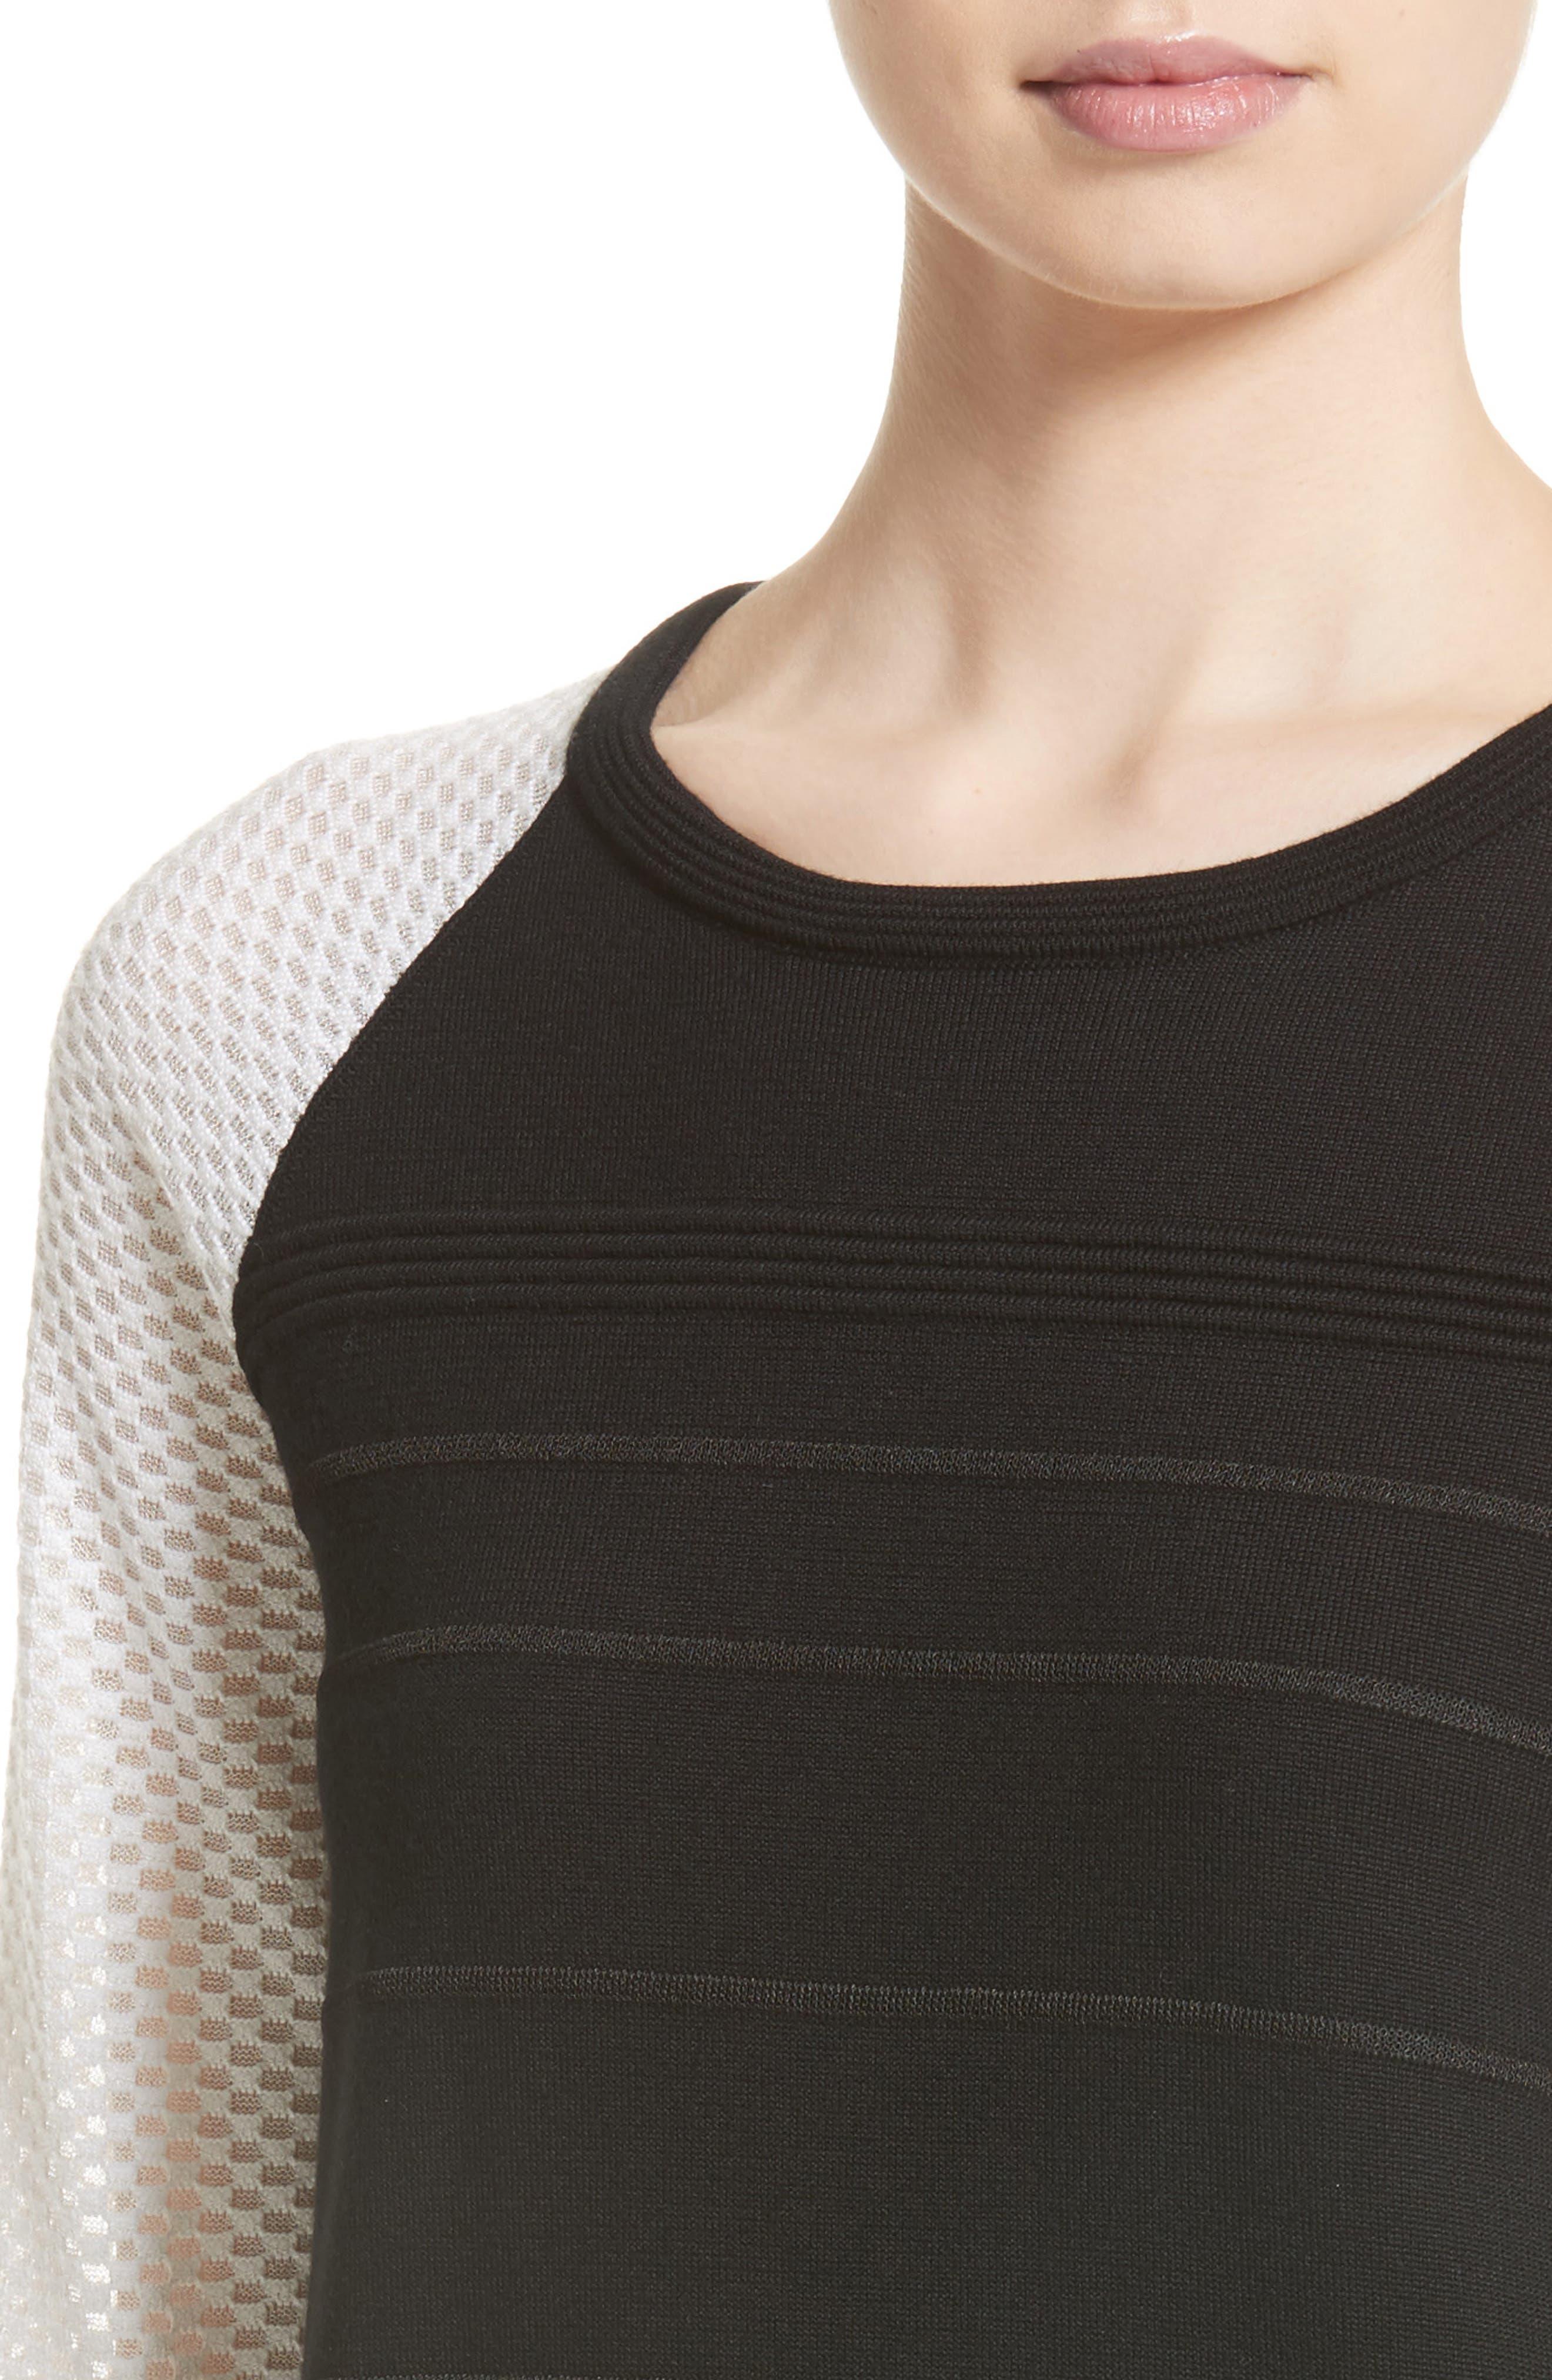 Ottoman Stitch Sweater,                             Alternate thumbnail 4, color,                             001